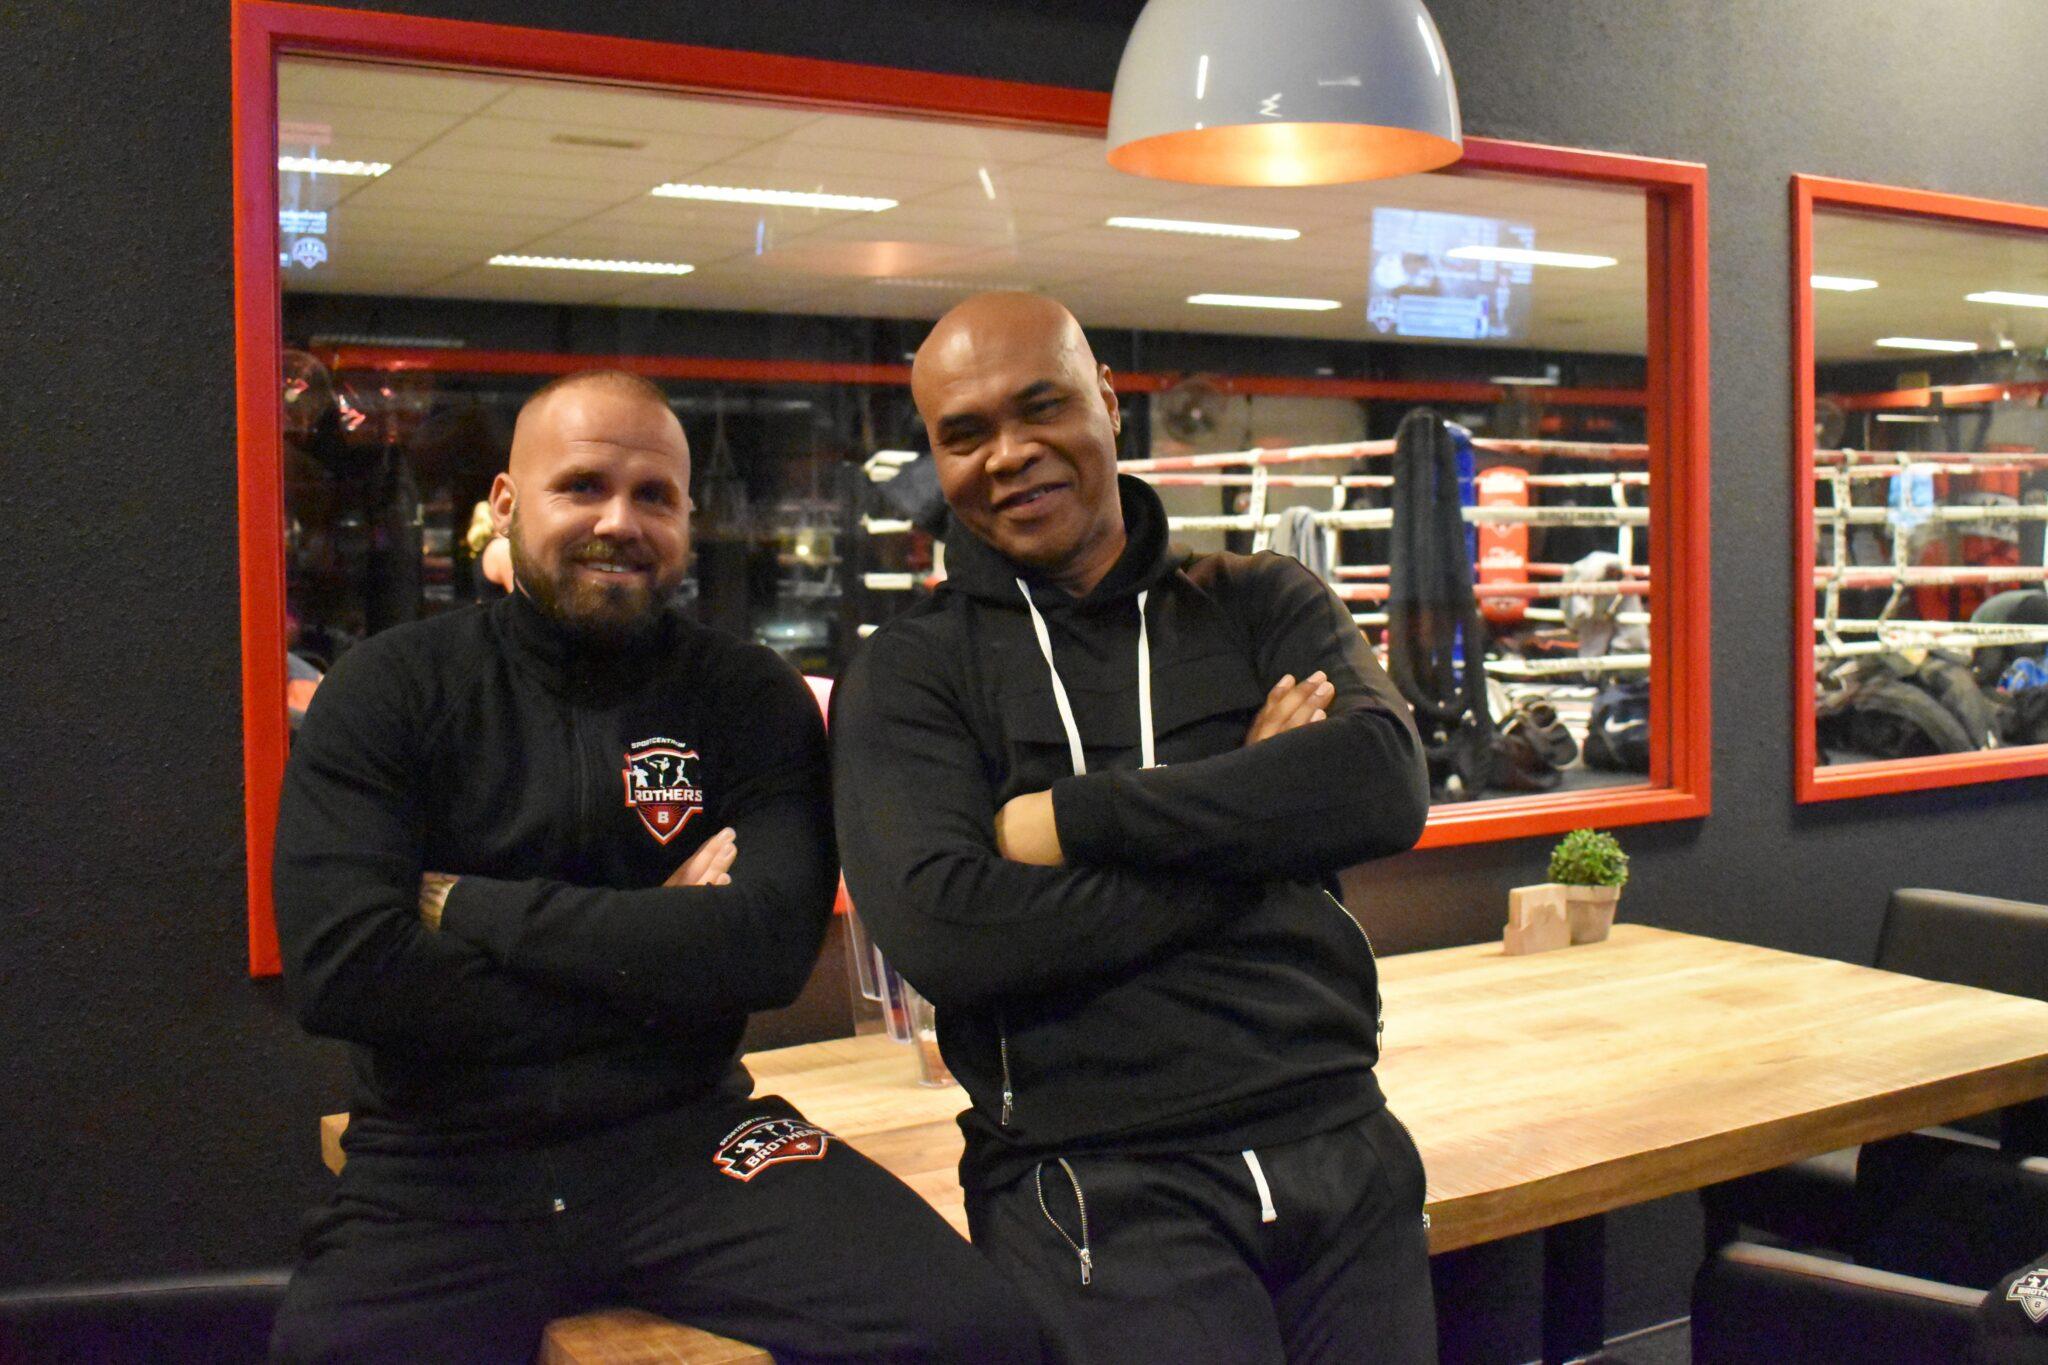 Bappie Tetteroo Sportschool Brothers